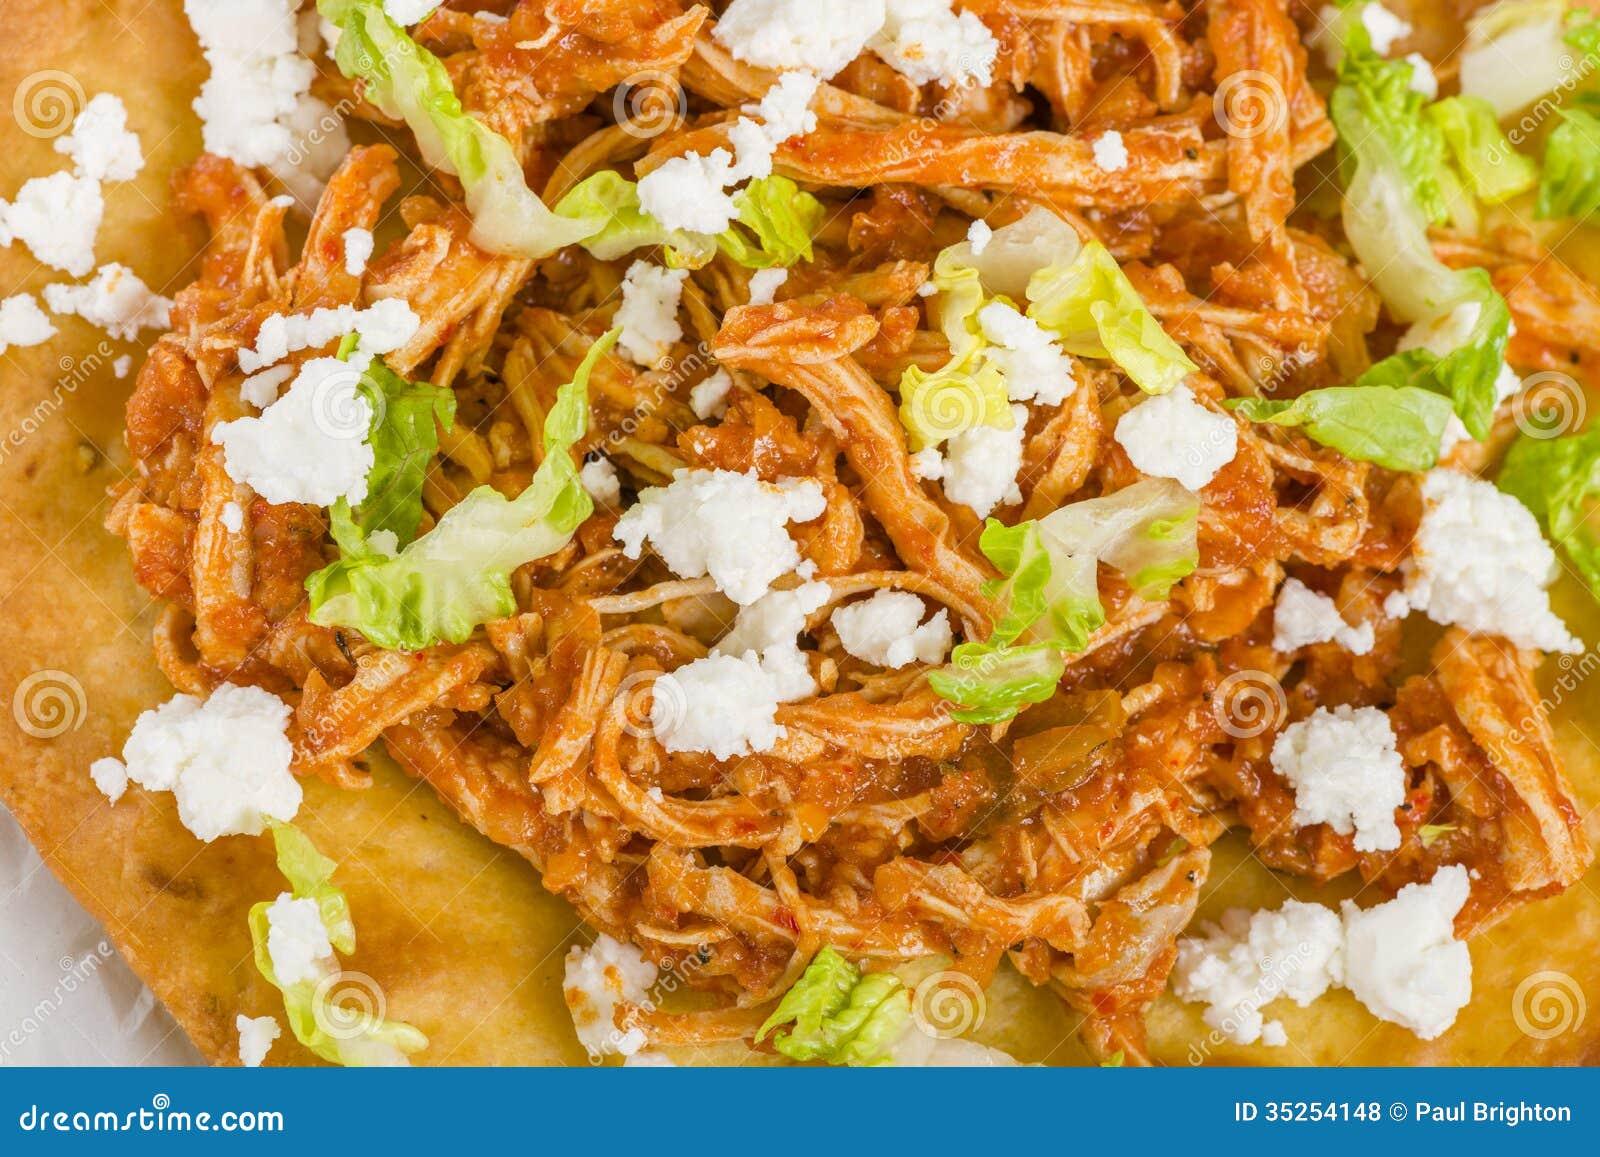 Tostadas stock photo. Image of gallo, fresh, lettuce ...